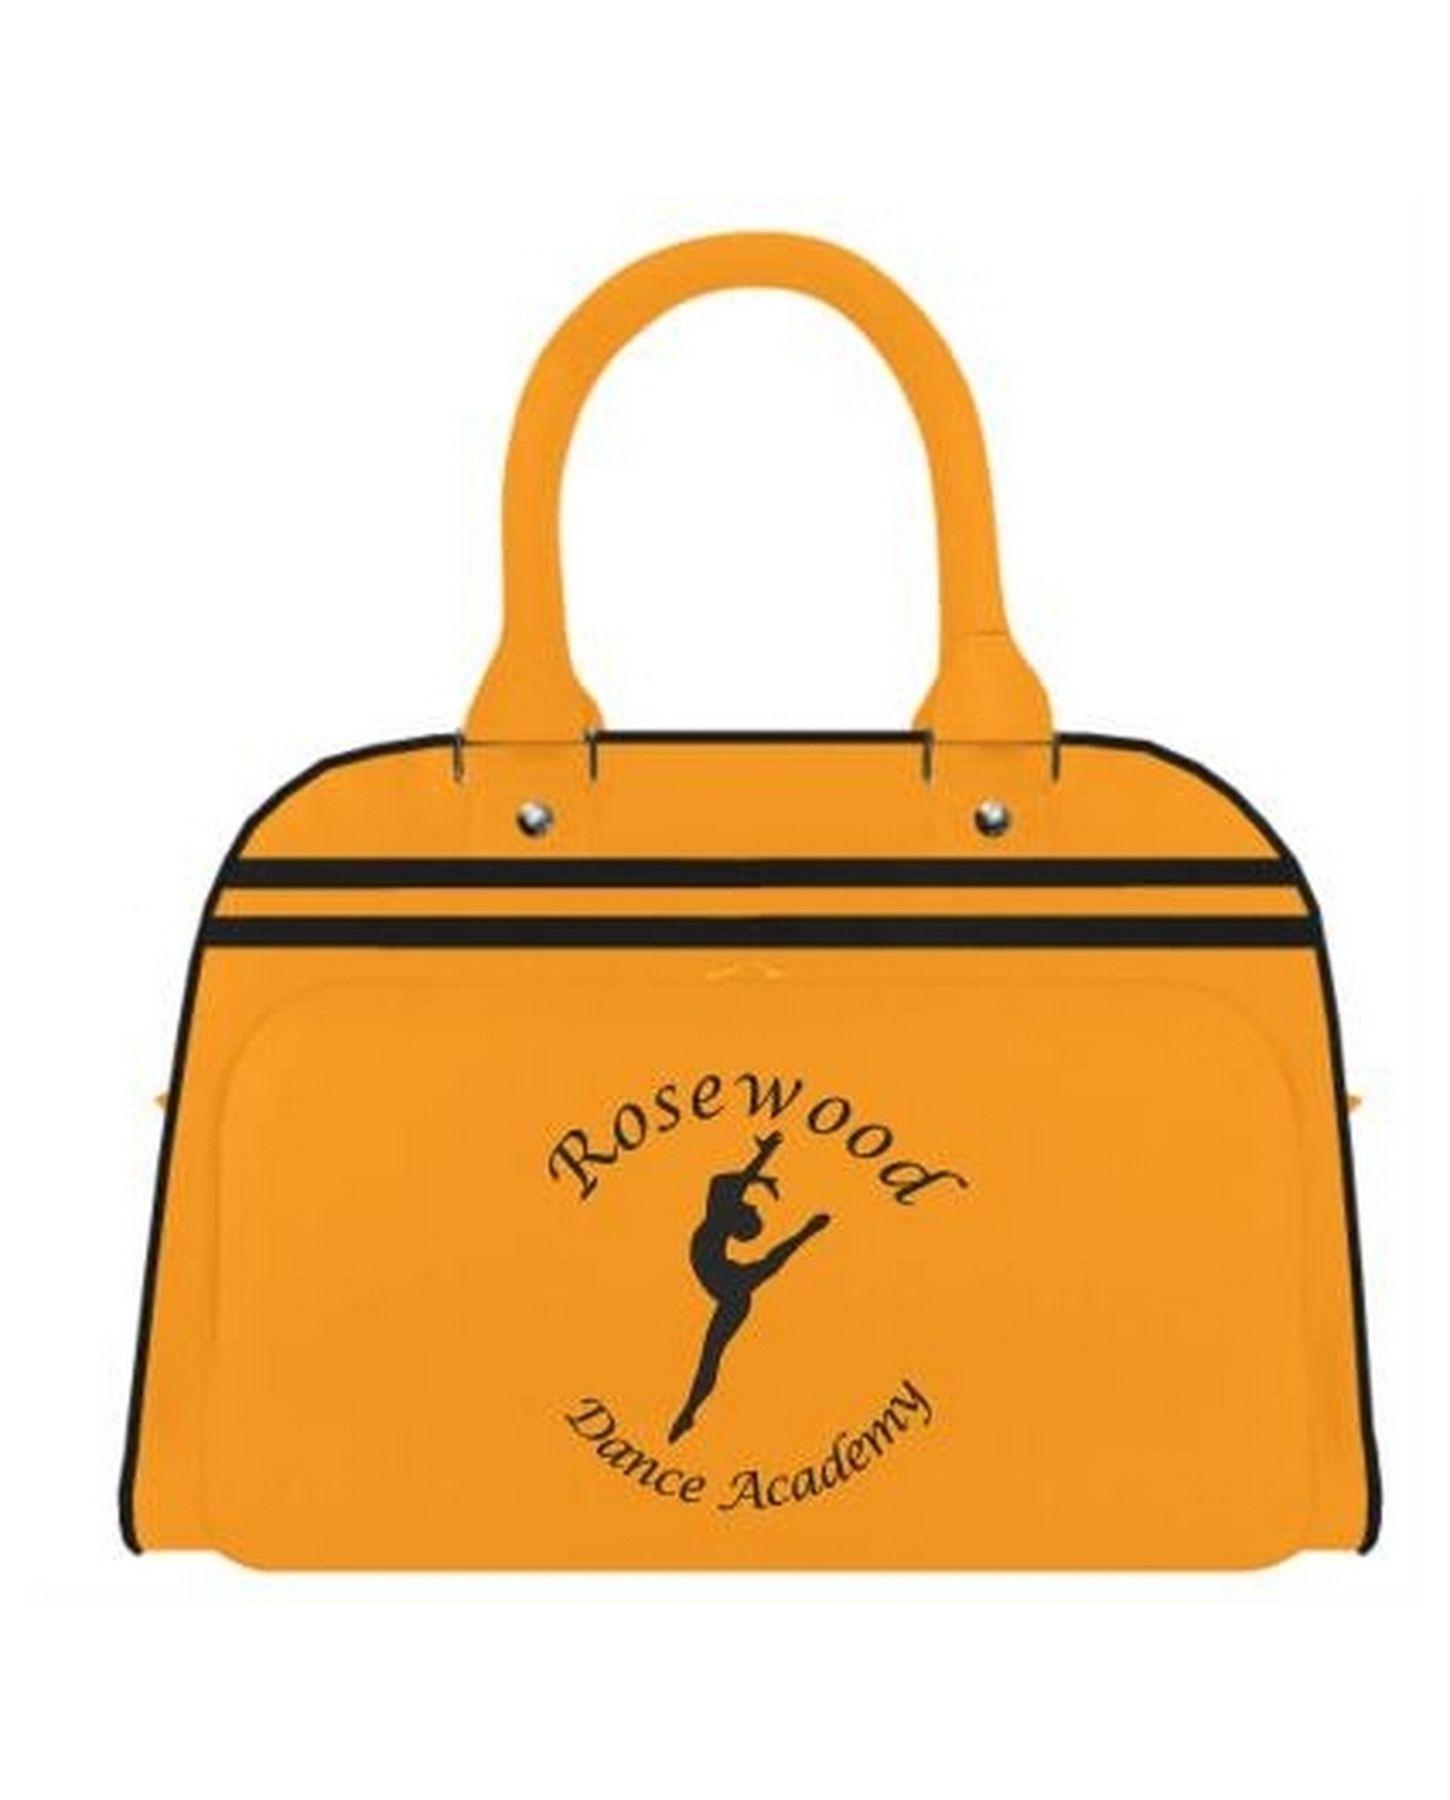 Rosewood Bag Large Bowler